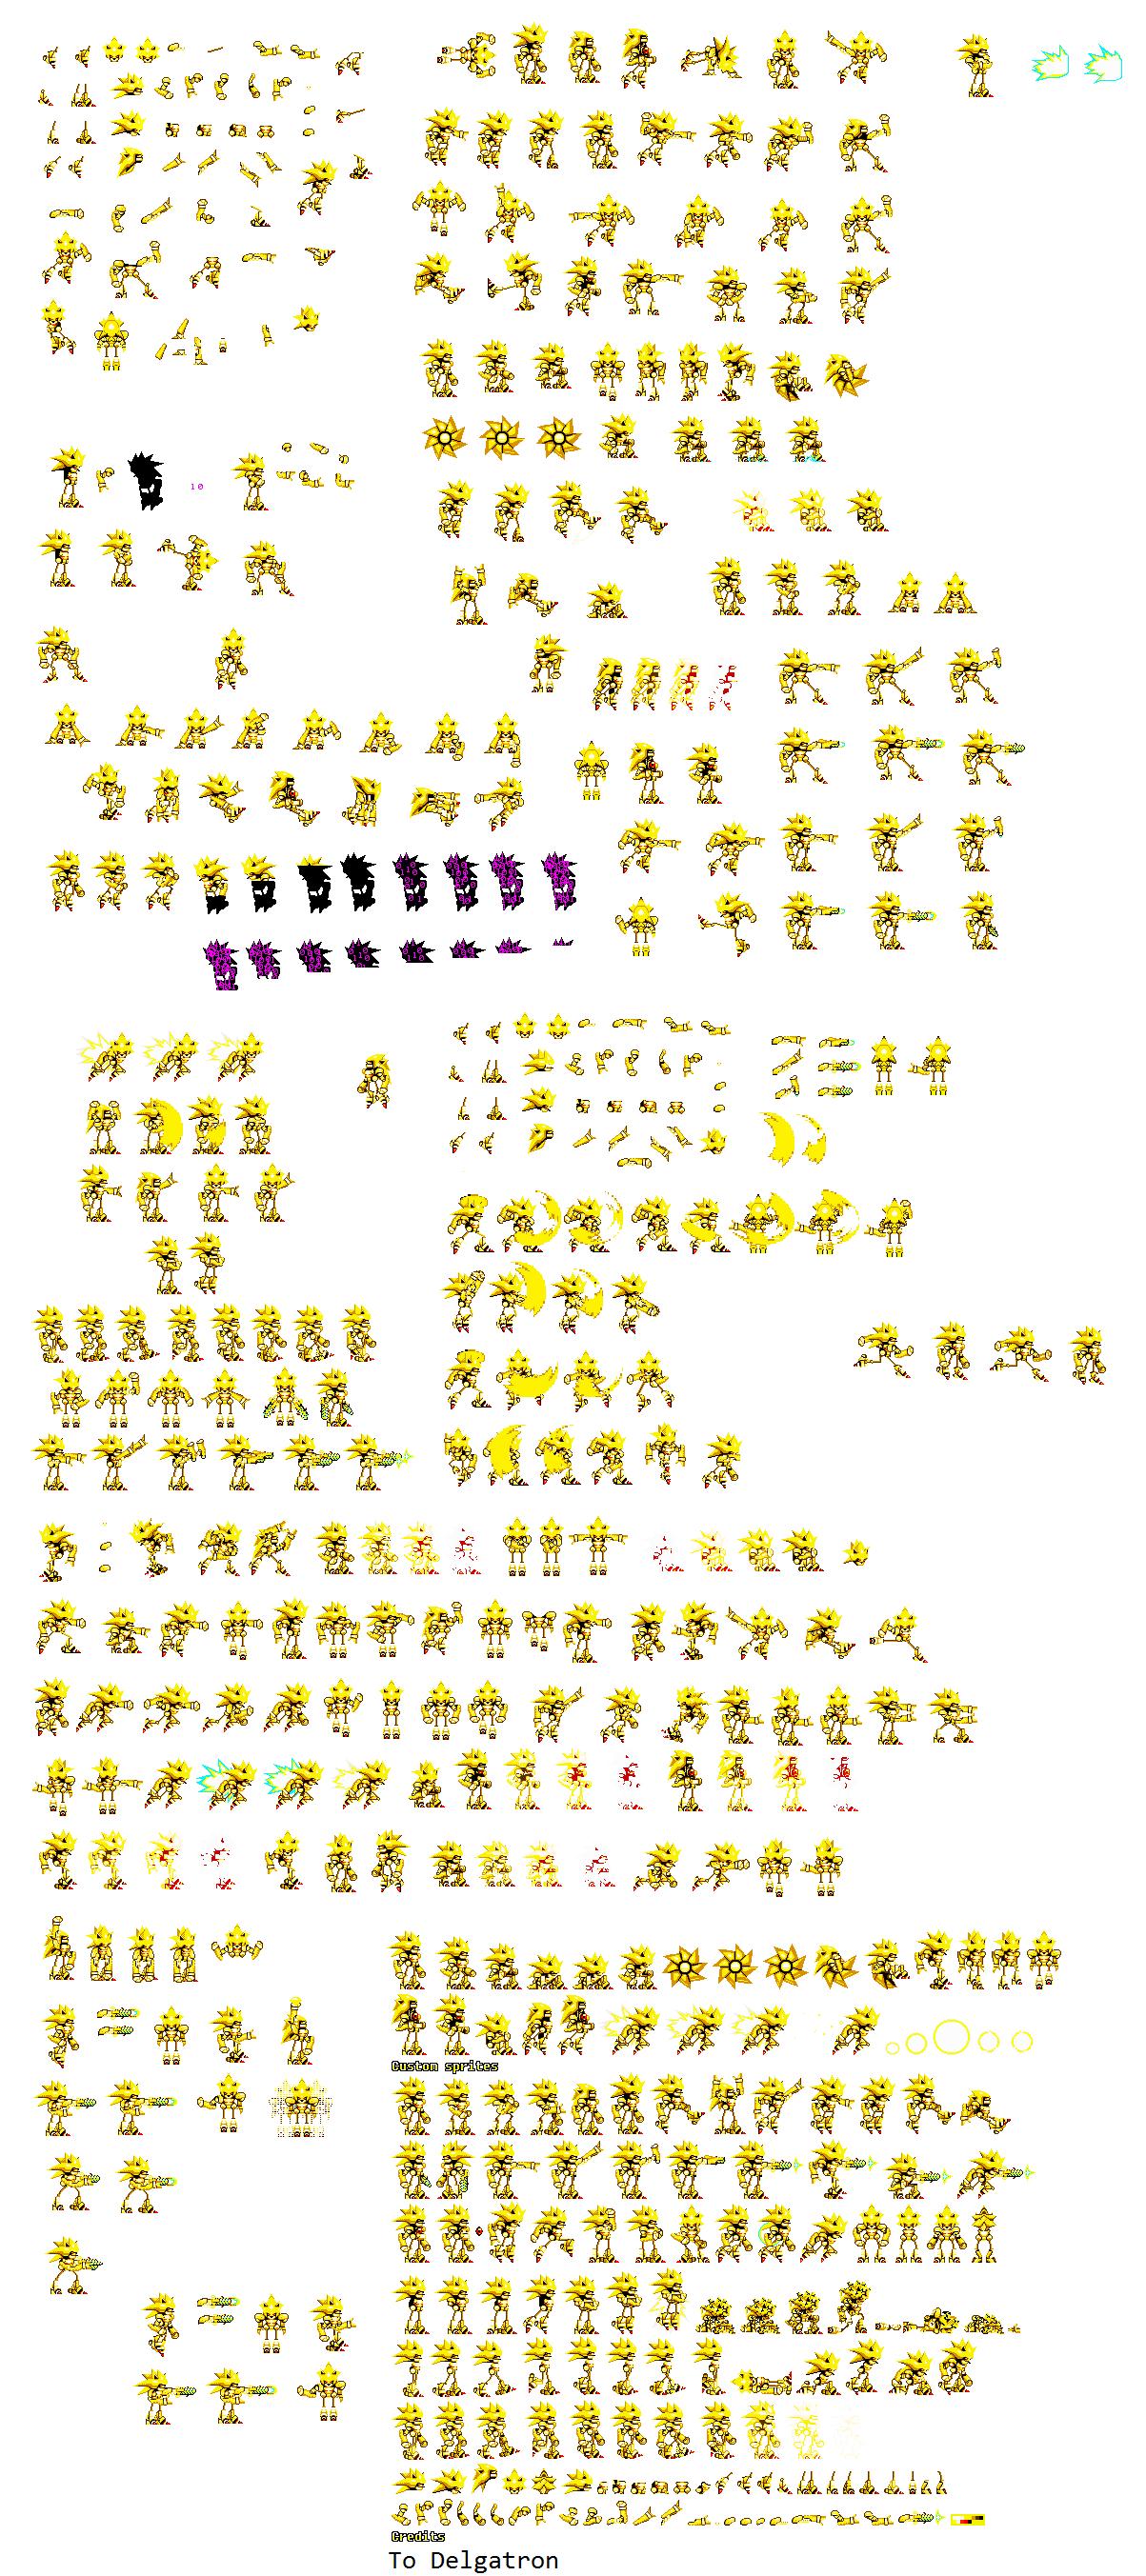 Super Mecha Sonic Sprite Sheet by DELGATRON on DeviantArt